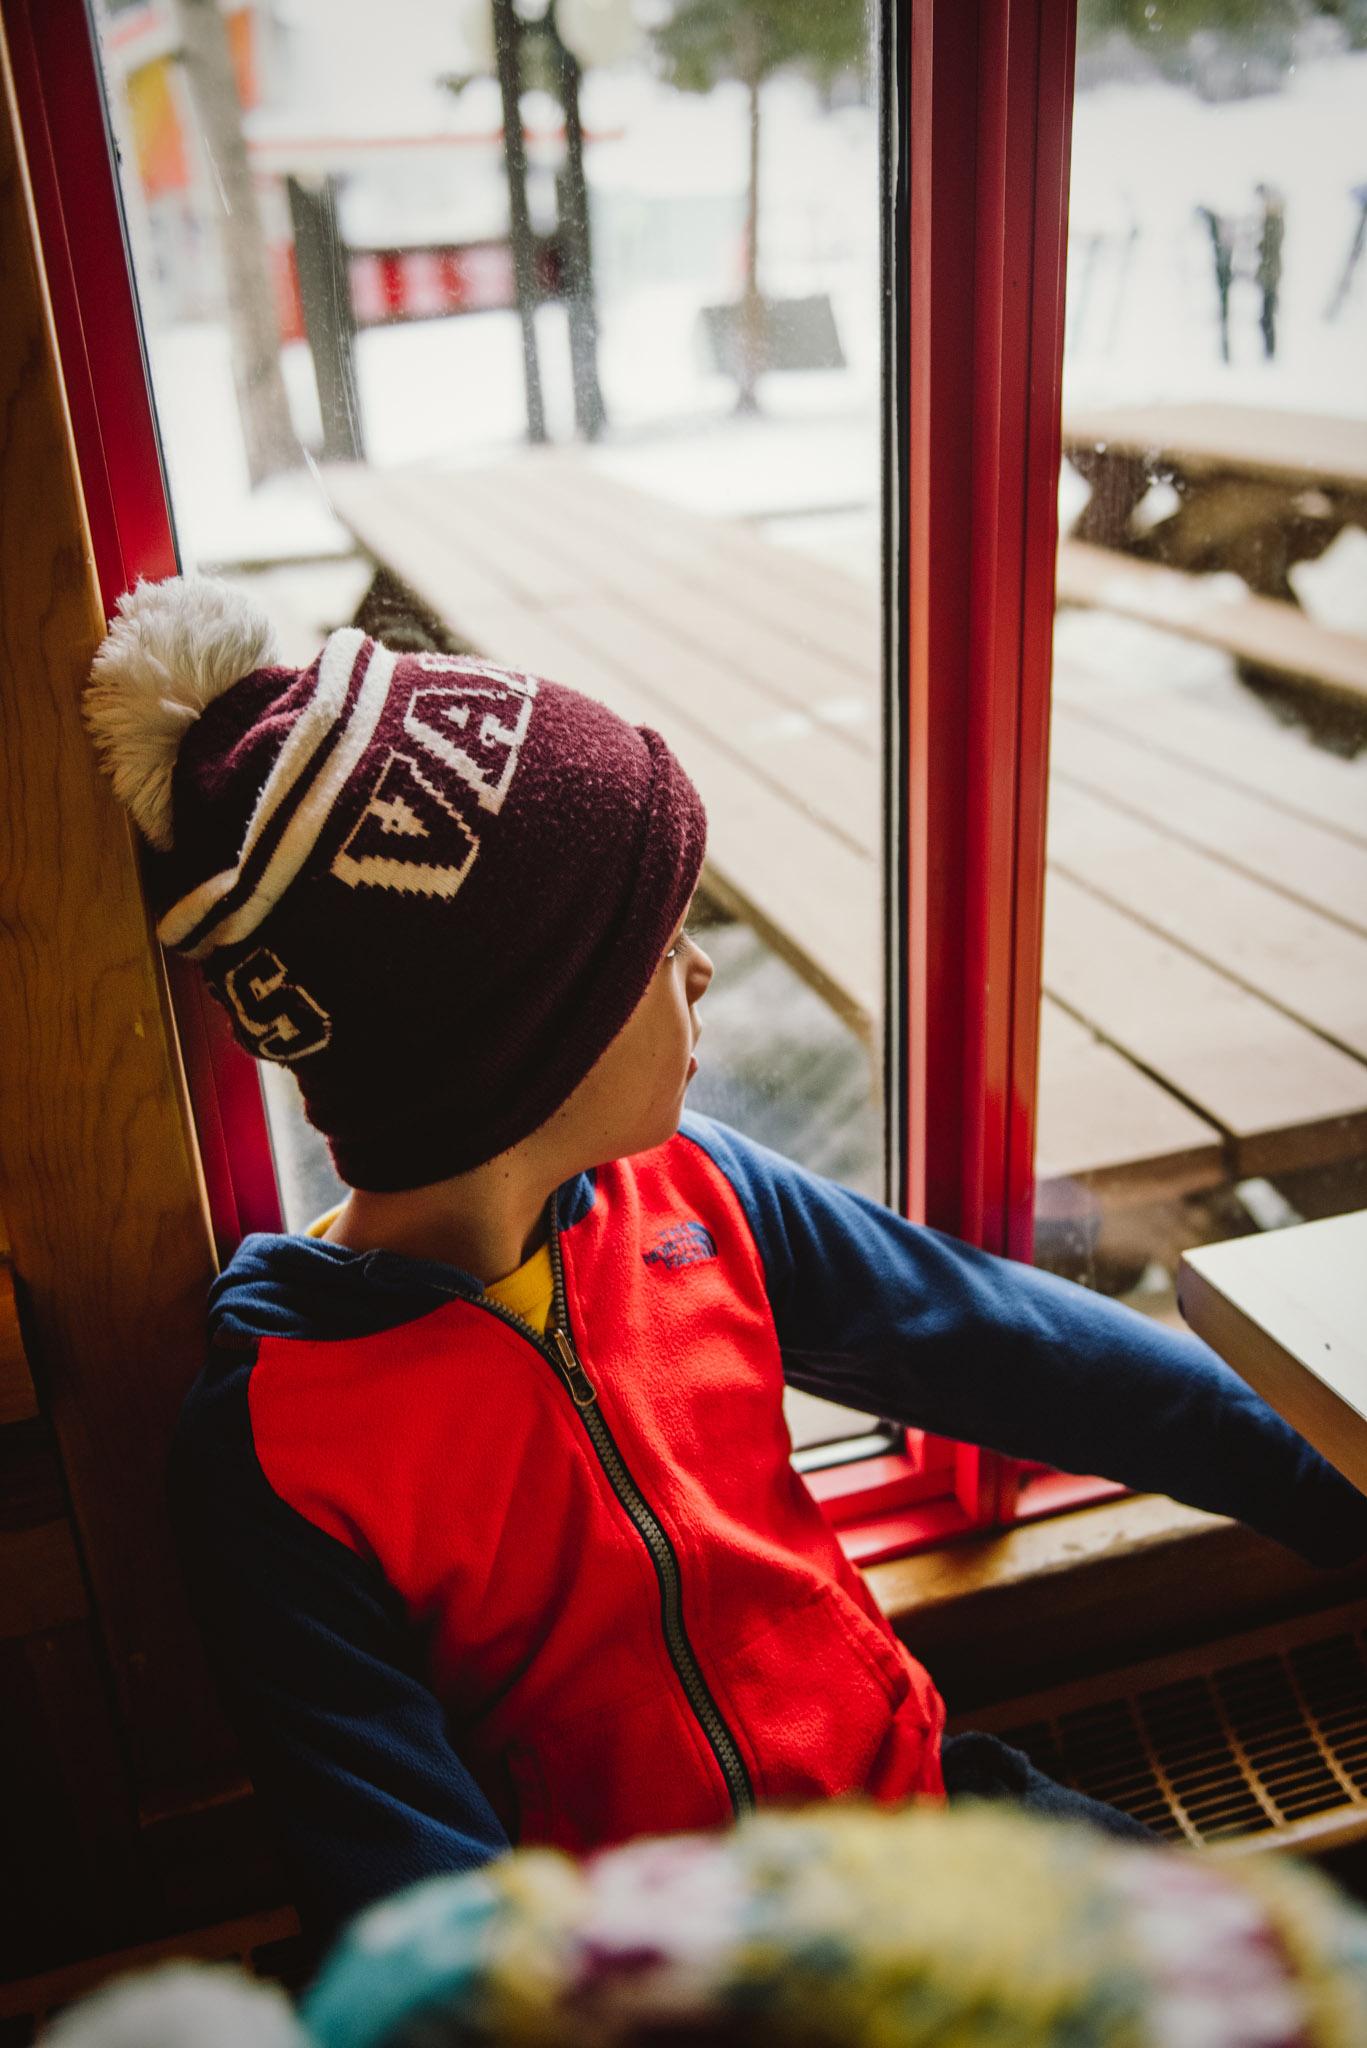 Chelsea Czibere - January 19, 2018 - Nakiska Ski Resort-8.jpg